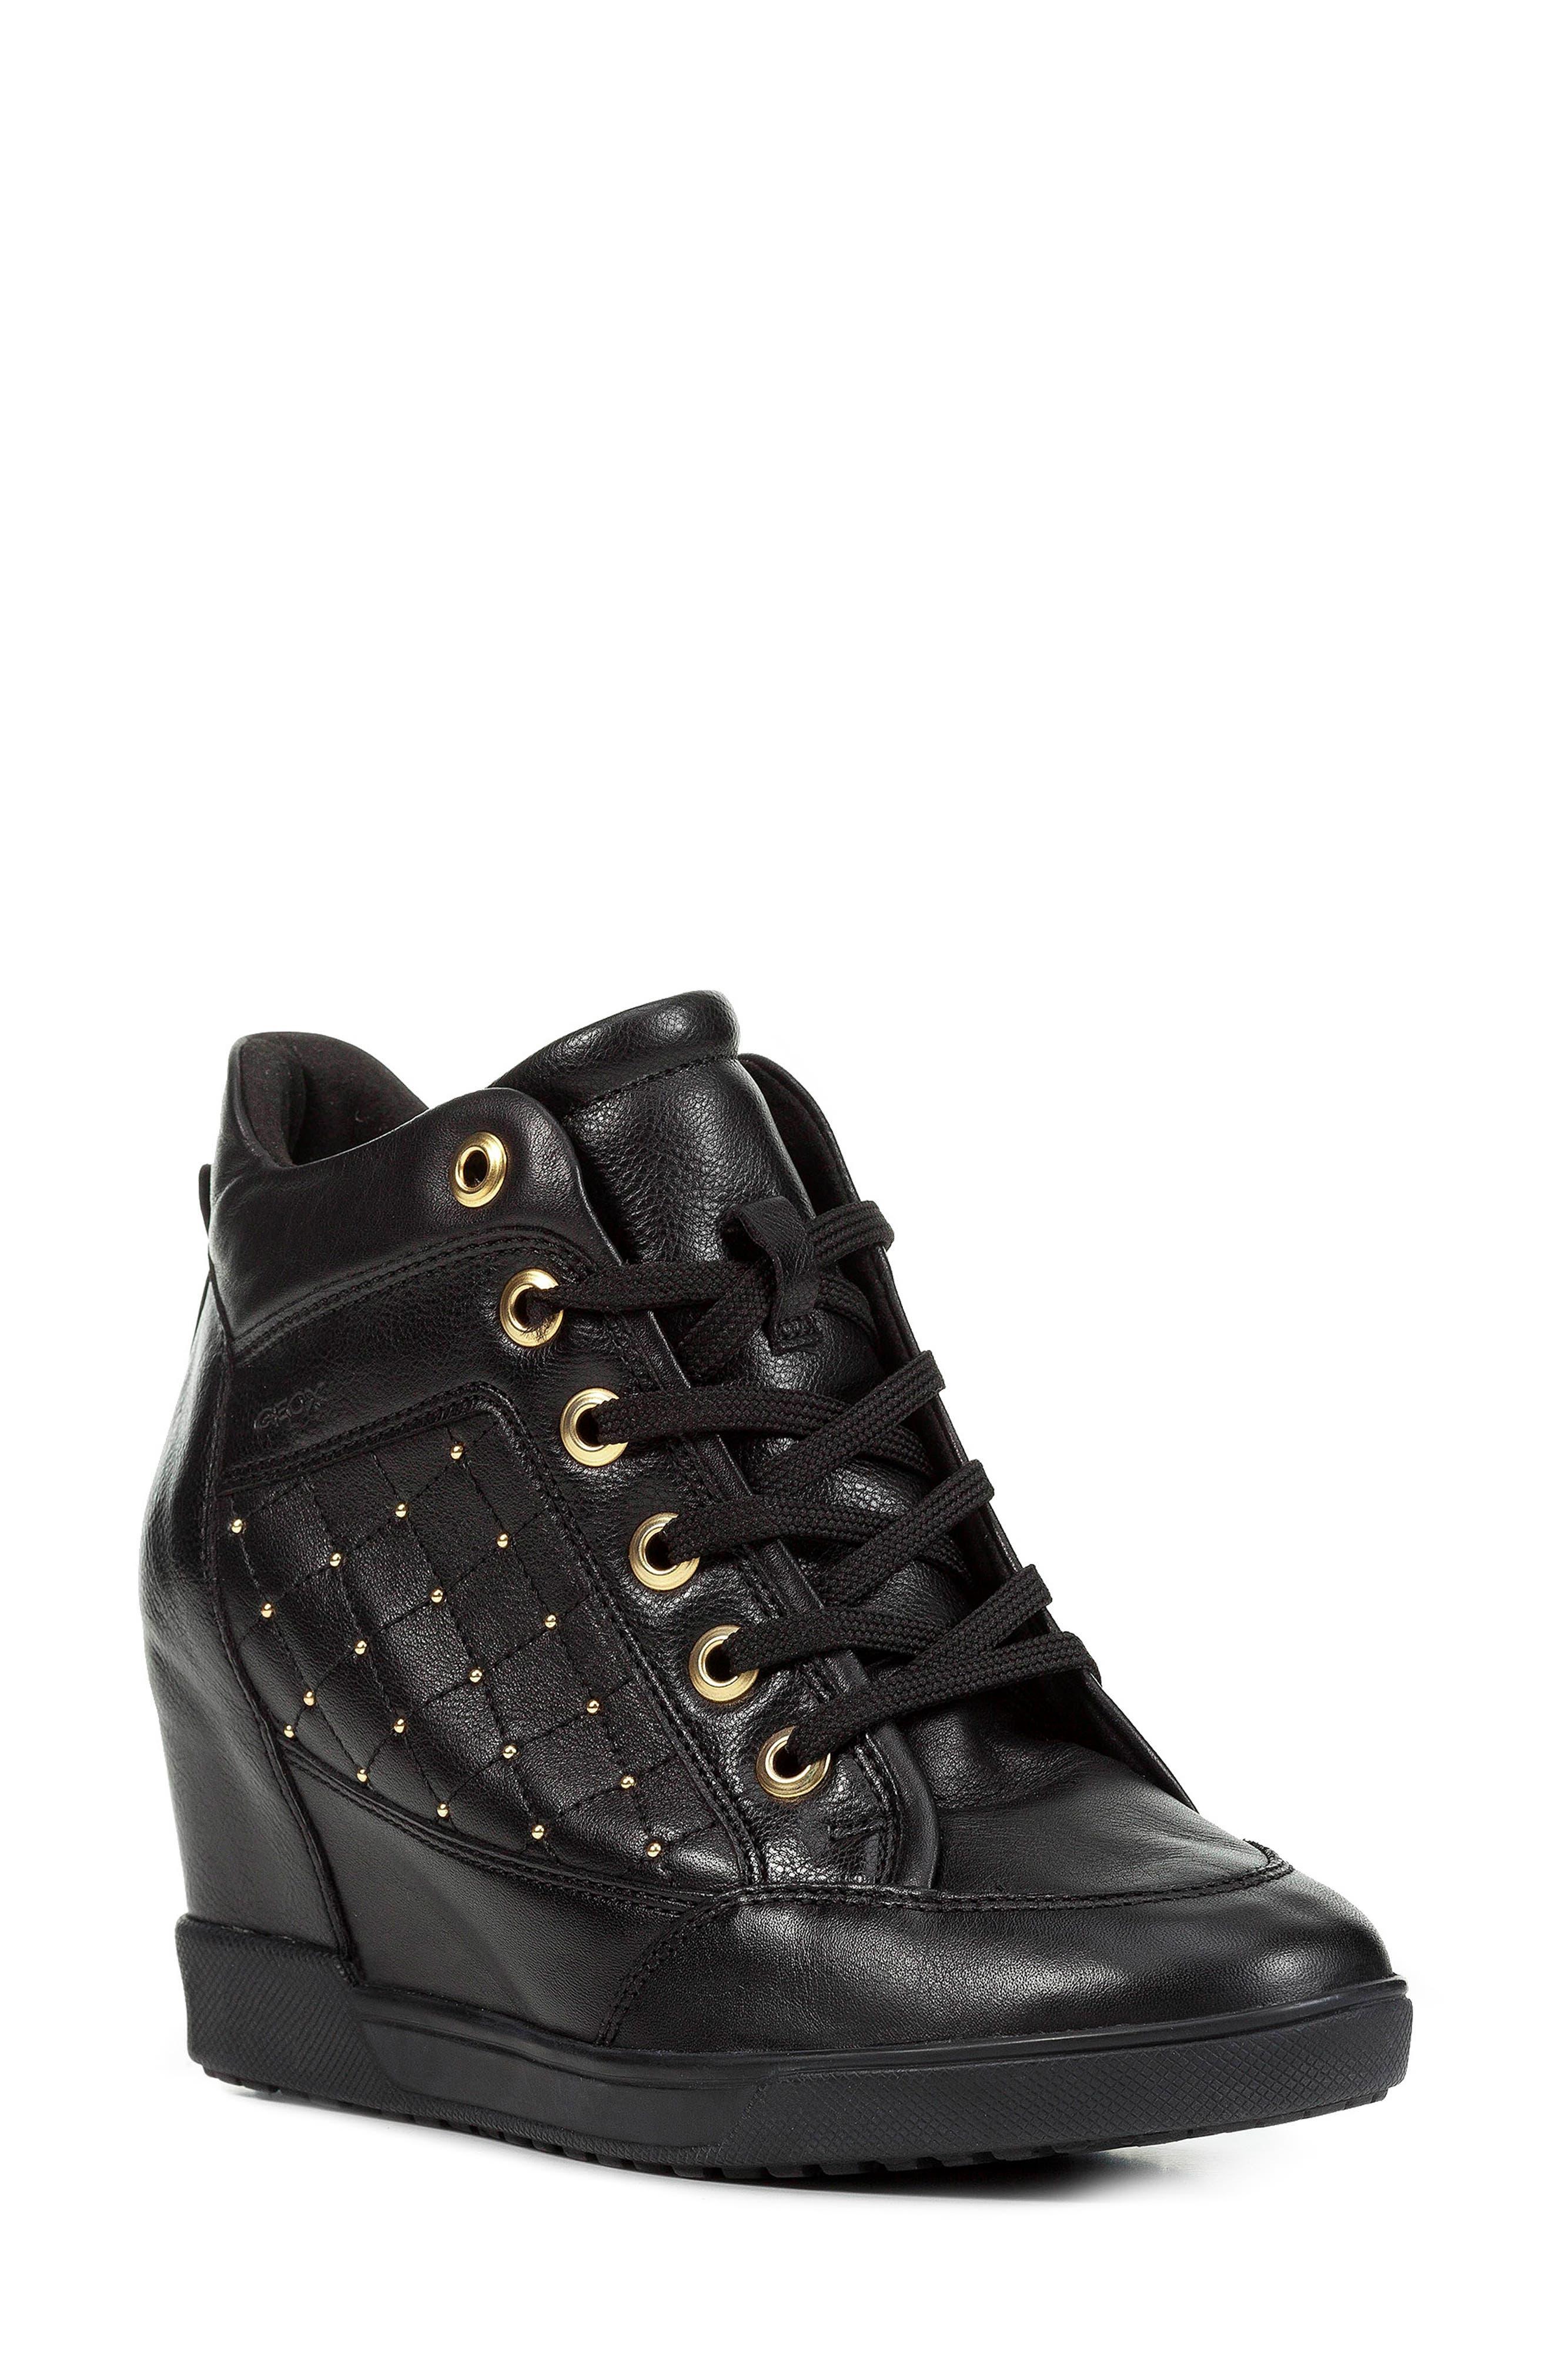 GEOX, Carum Wedge Sneaker, Main thumbnail 1, color, 001